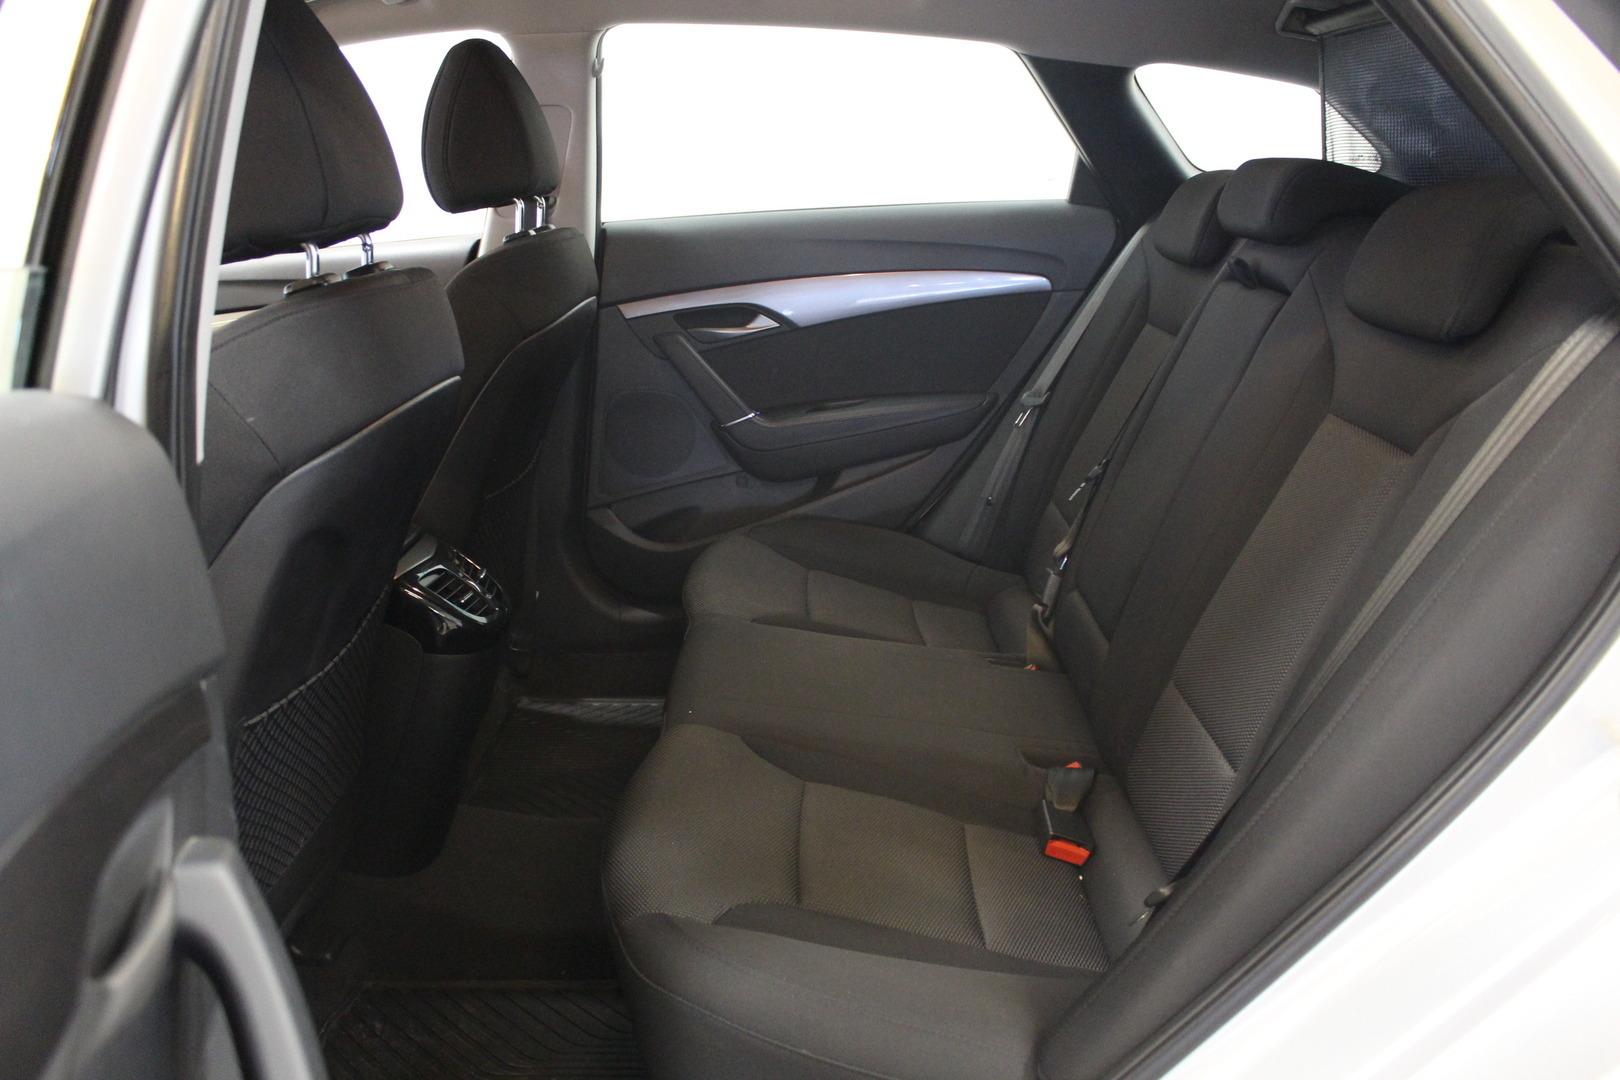 Hyundai i40 Wagon, 1,6 6MT ISG Classic #Huippusiisti #Vähän ajettu #Takuu